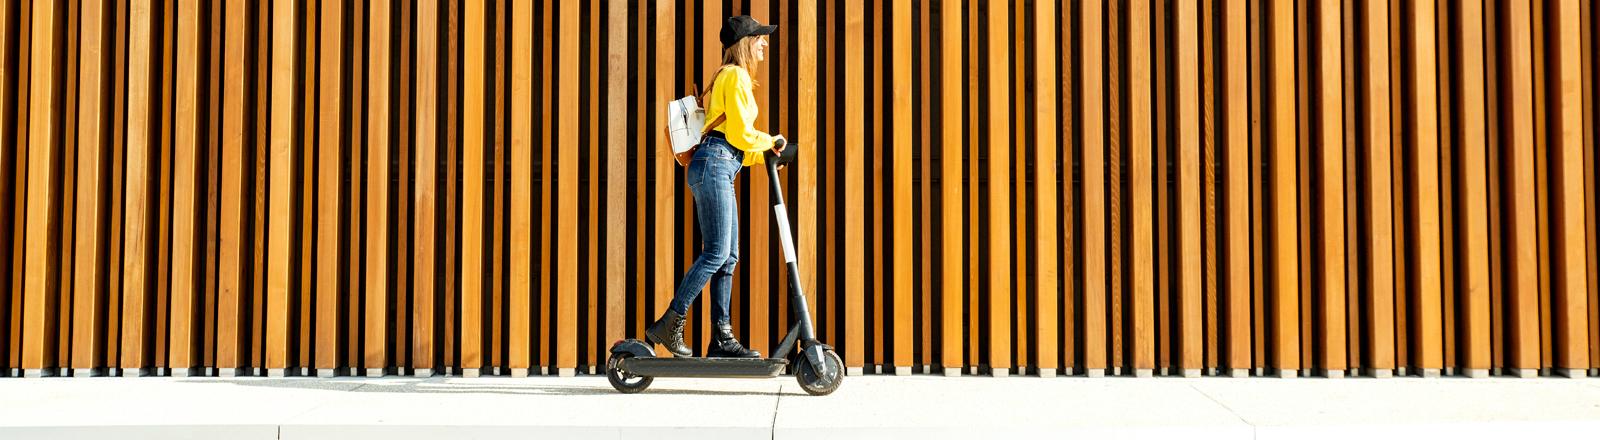 Eine Frau fährt E-Scooter.